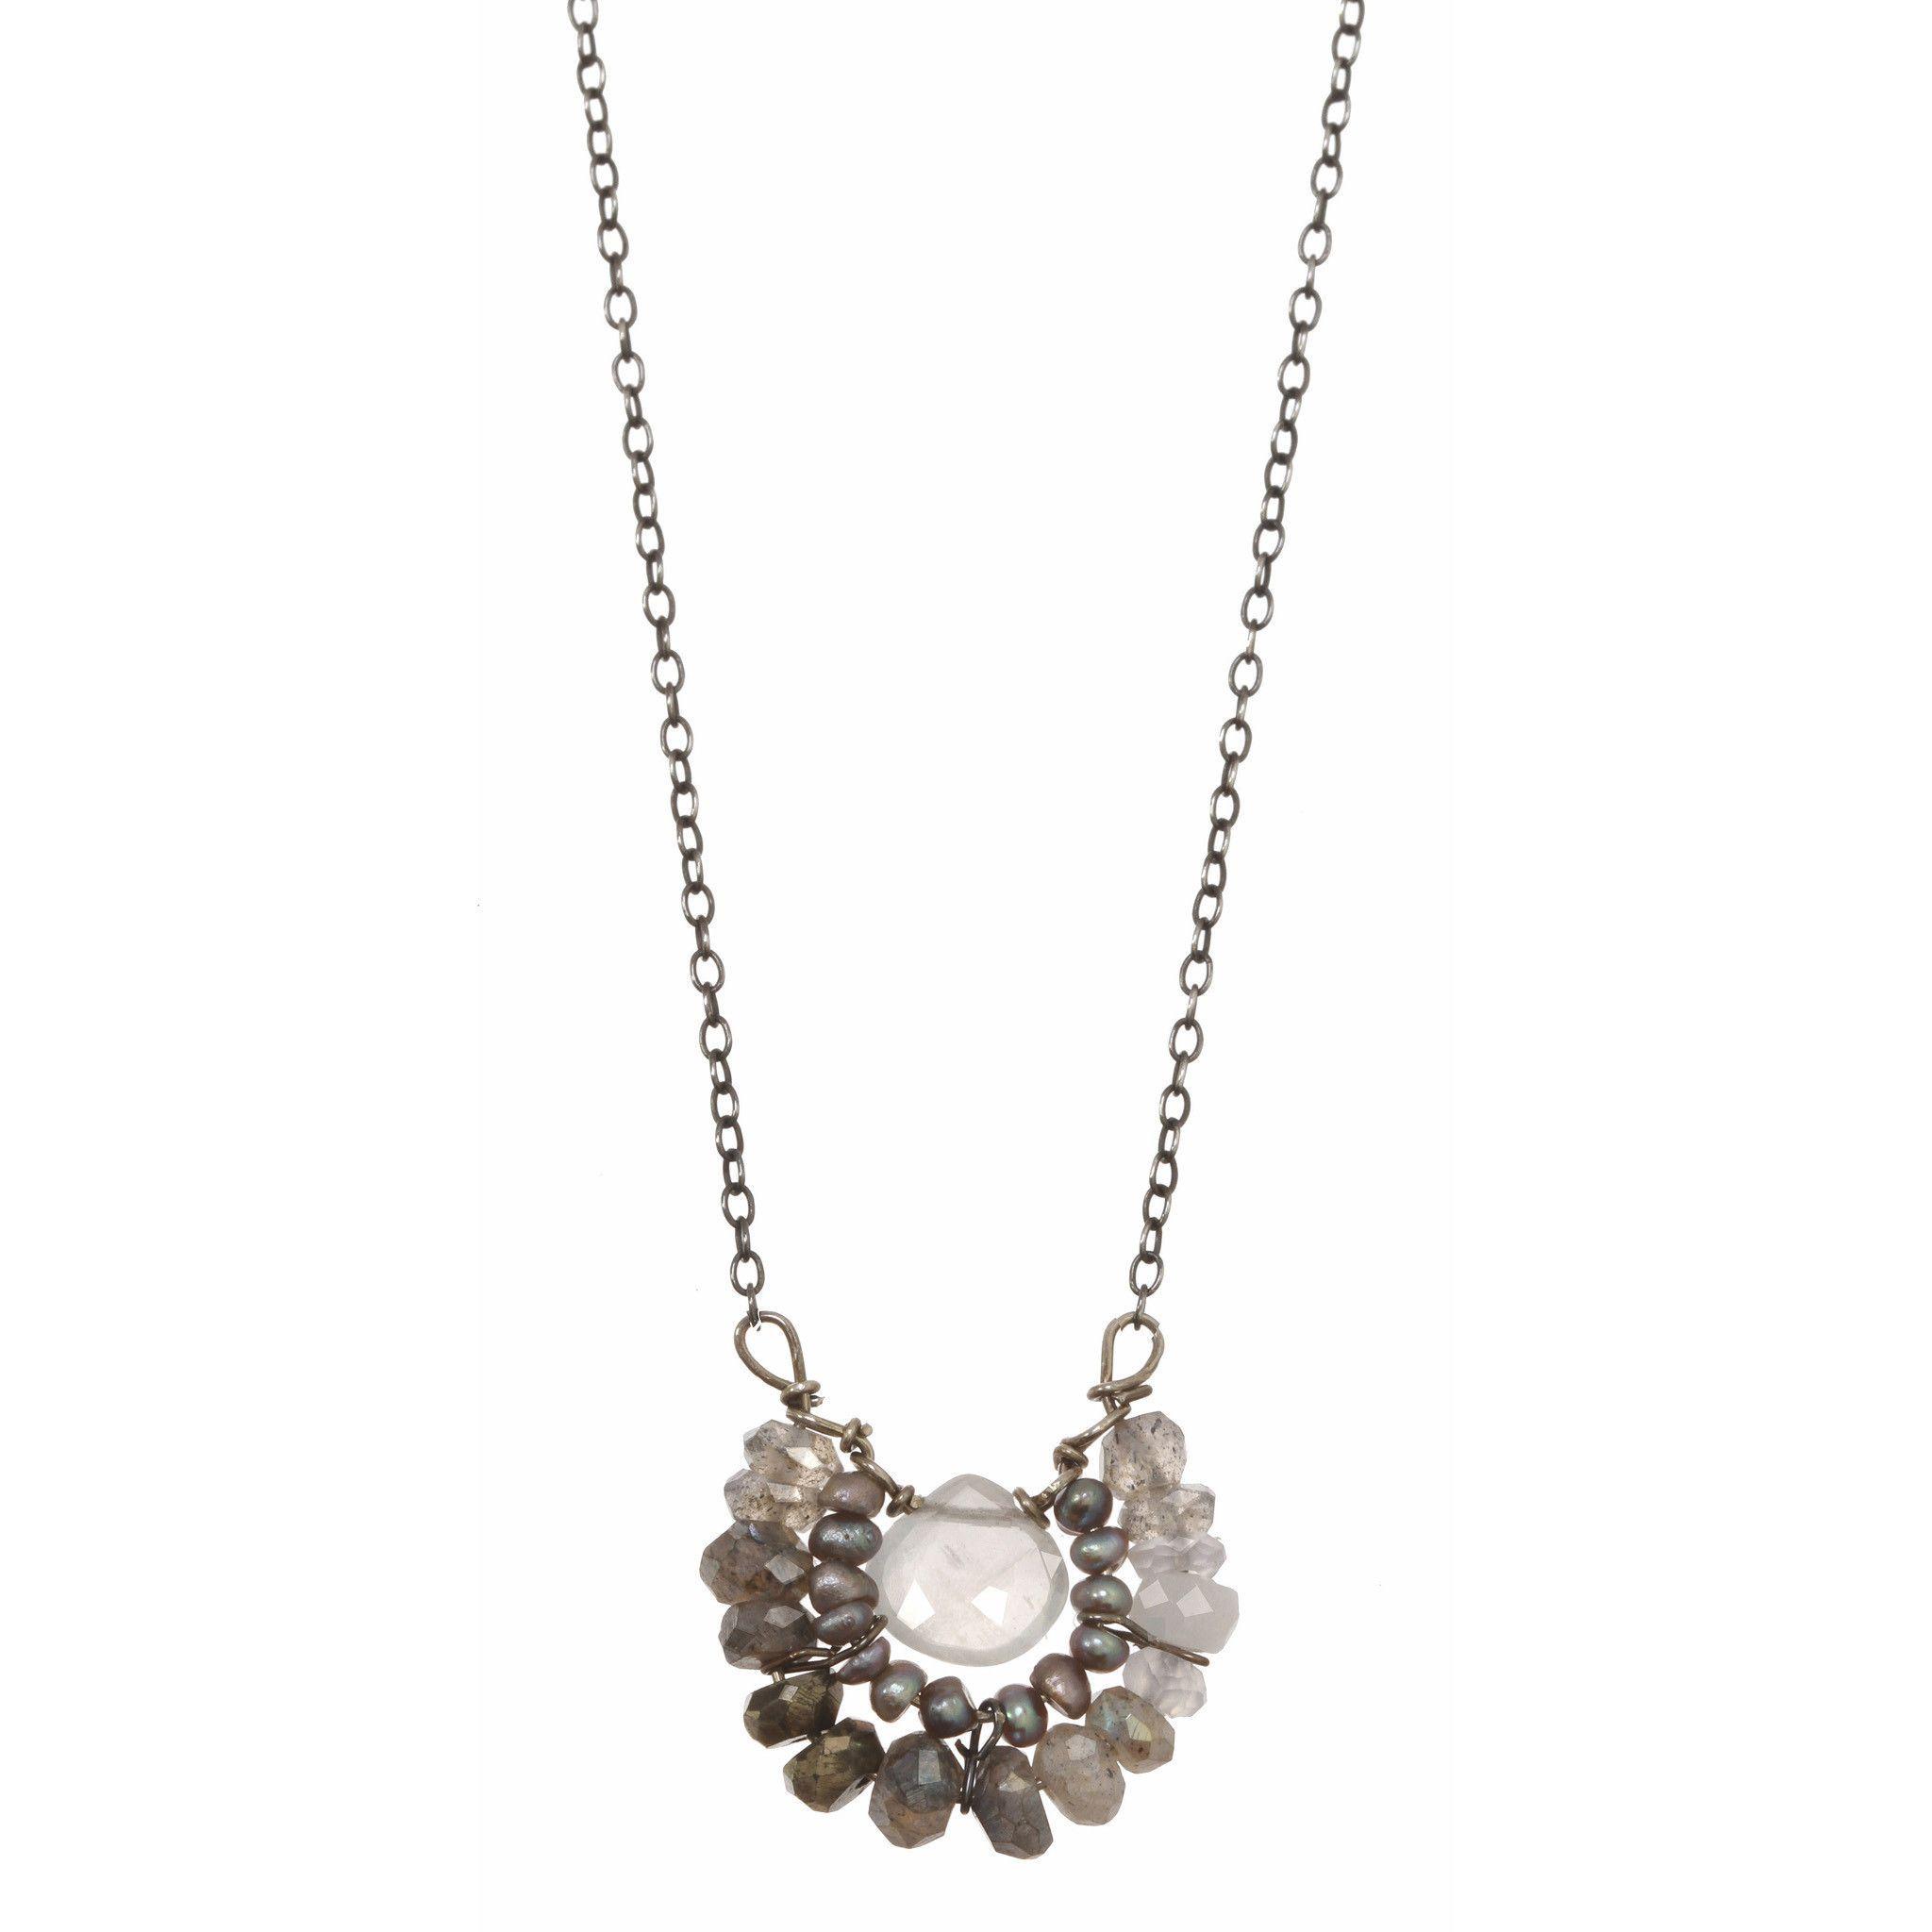 Michelle Pressler Necklace Labradorite and Pearl 2353 Artistic